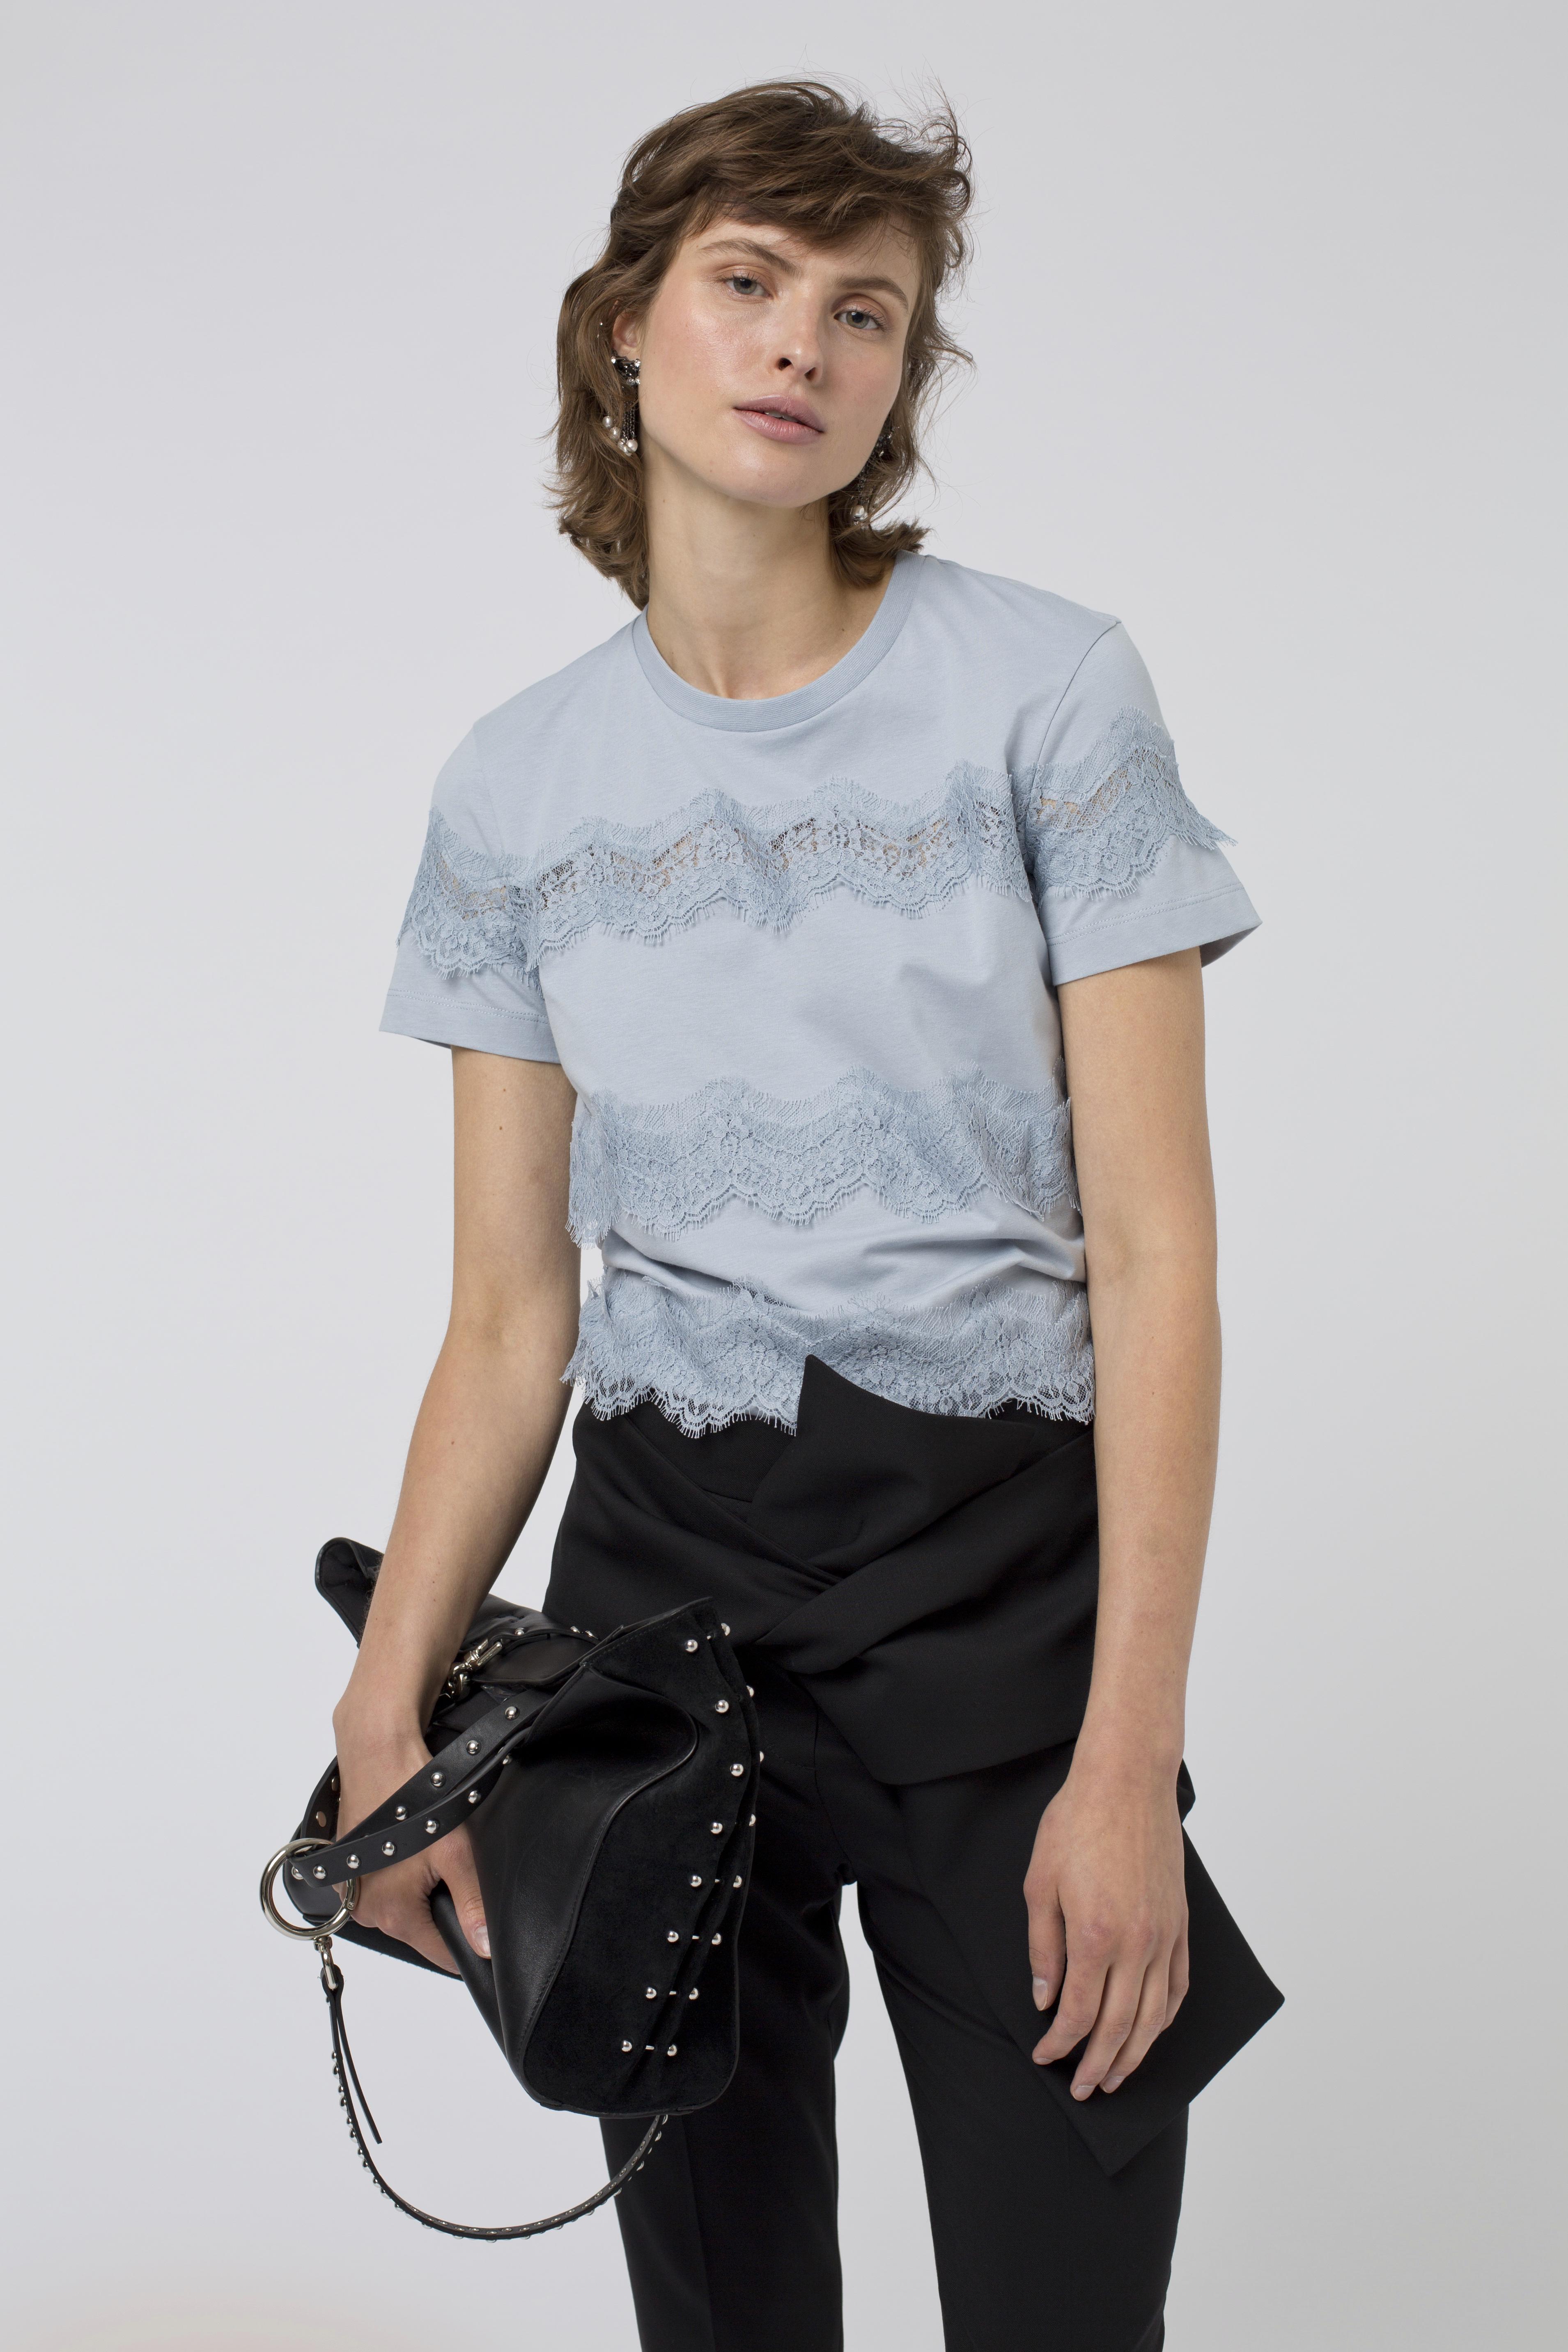 Dorothee en Rebellion Schumacher Sweet Shirt 14 Lyst Blue 7Xq7rpwP dbcf83cdafe3